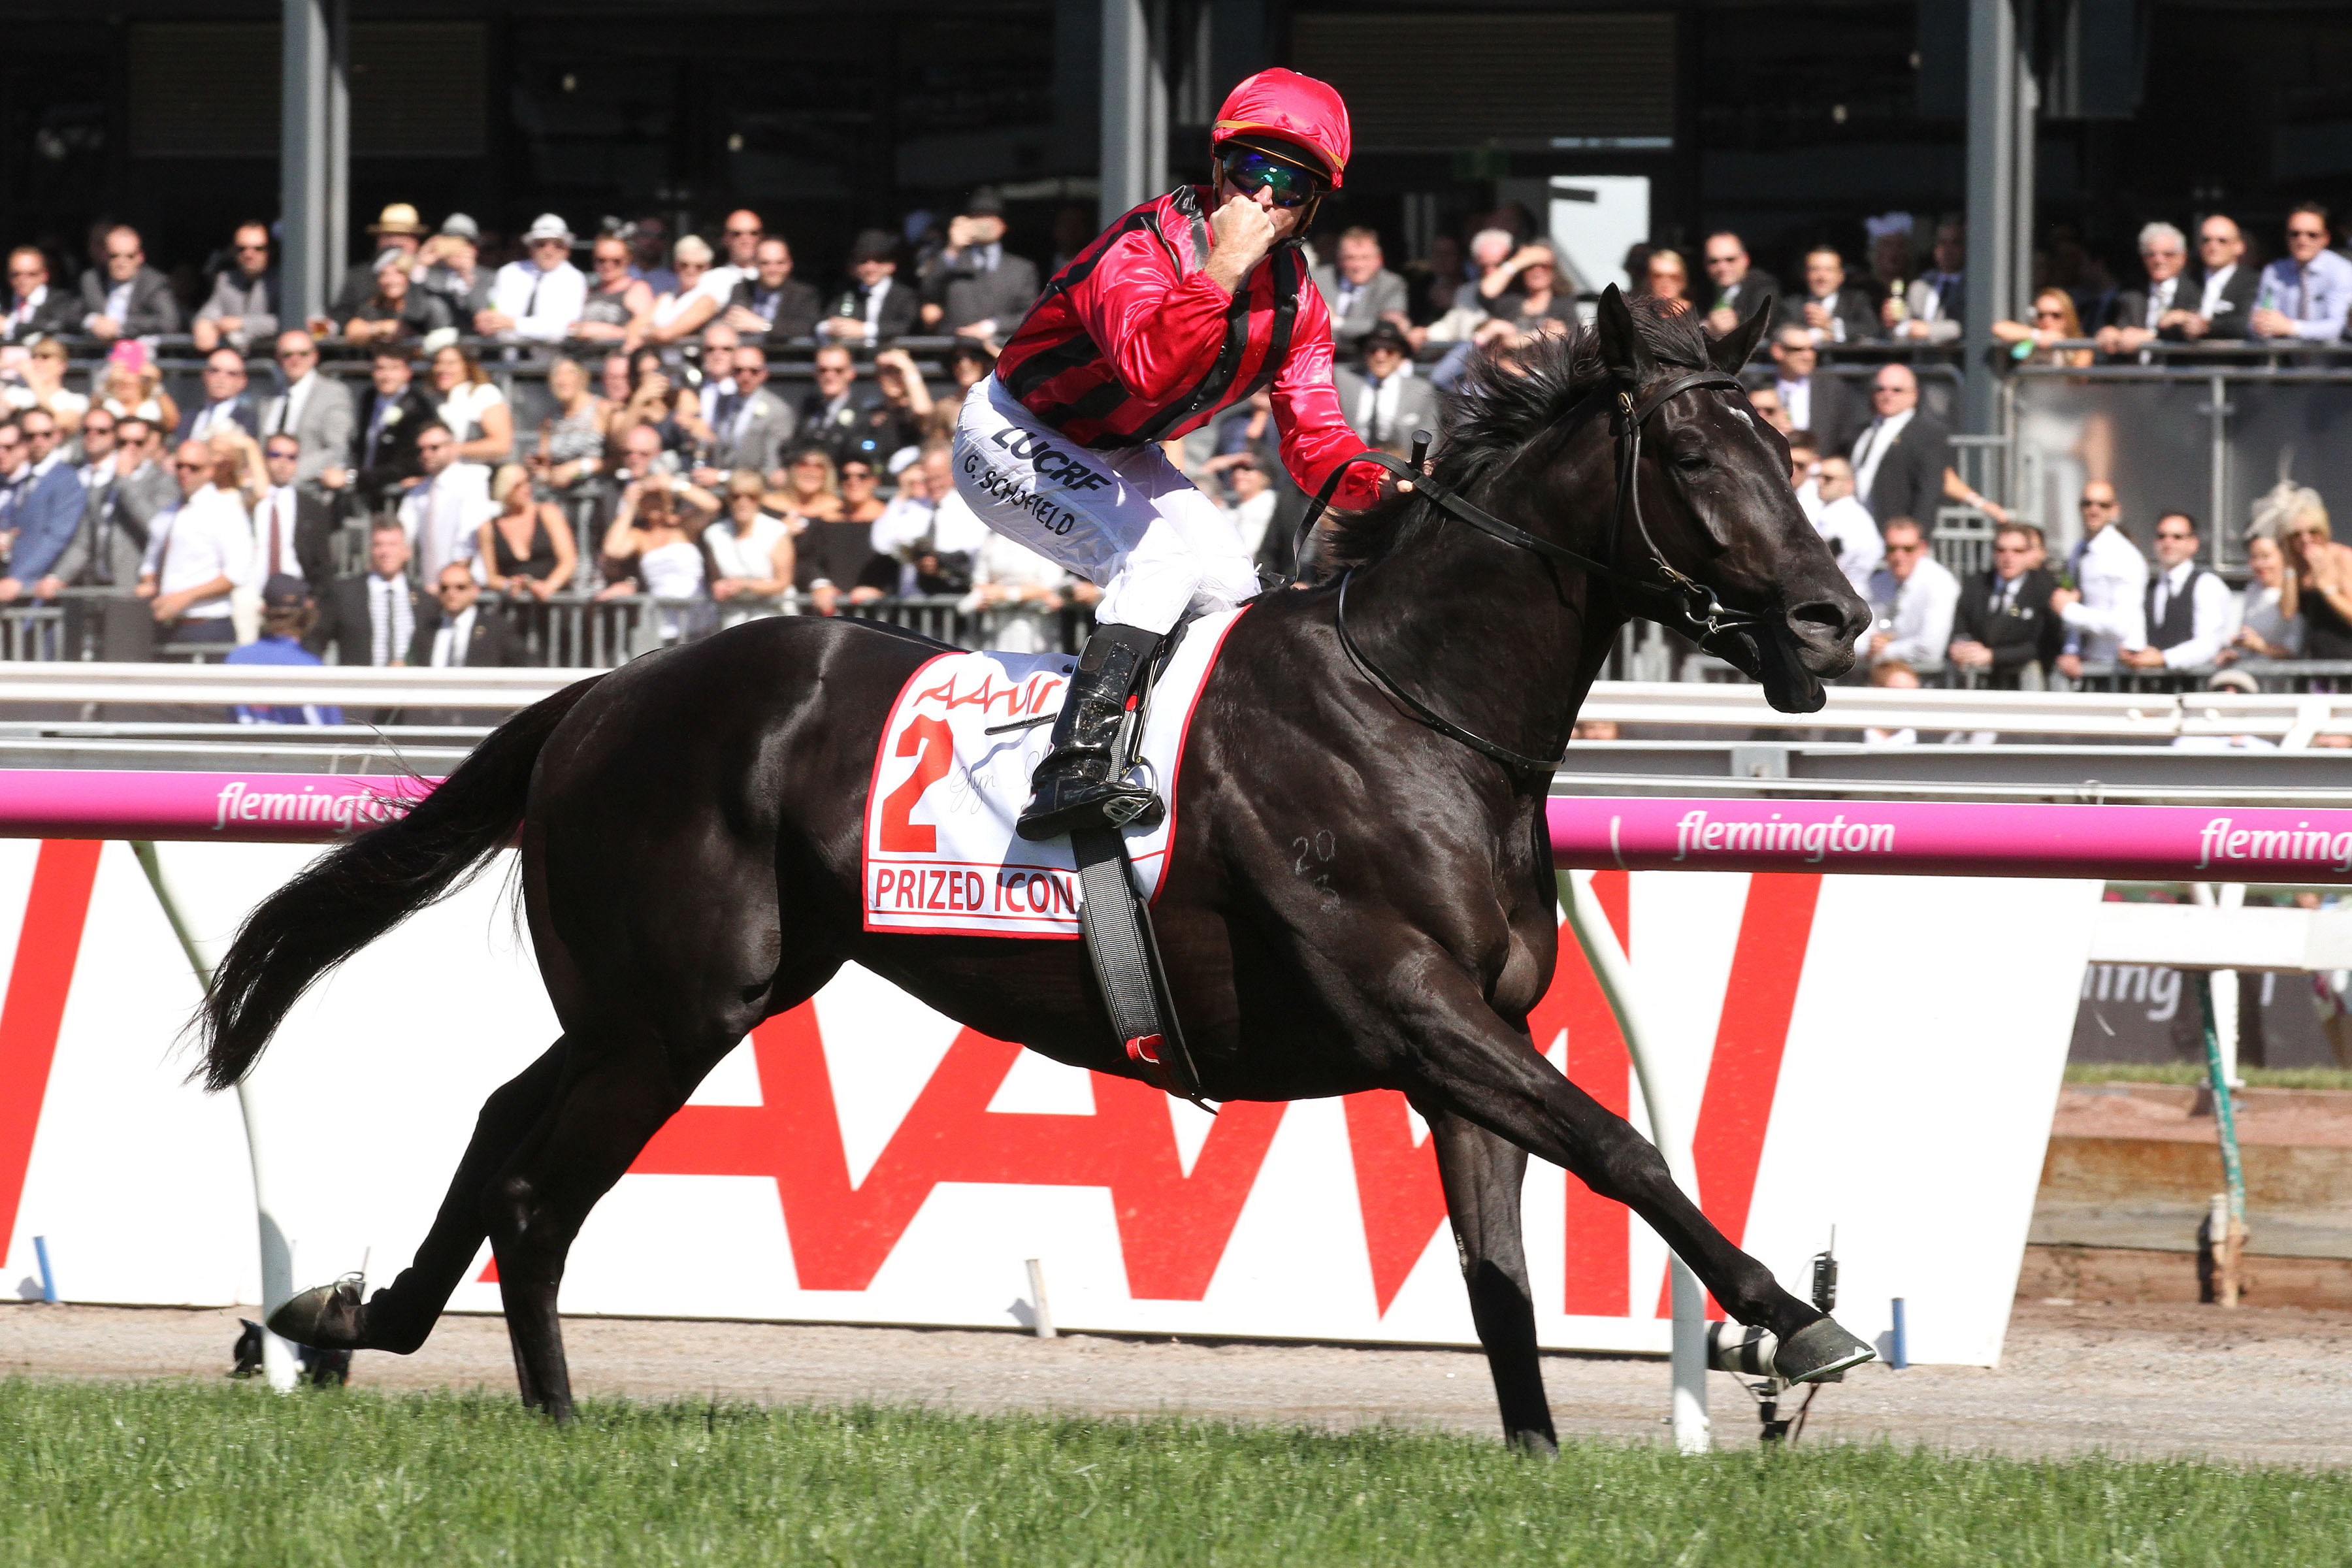 https://www.stallions.com.au/wp-content/uploads/2020/03/PRIZED-ICON1.jpg